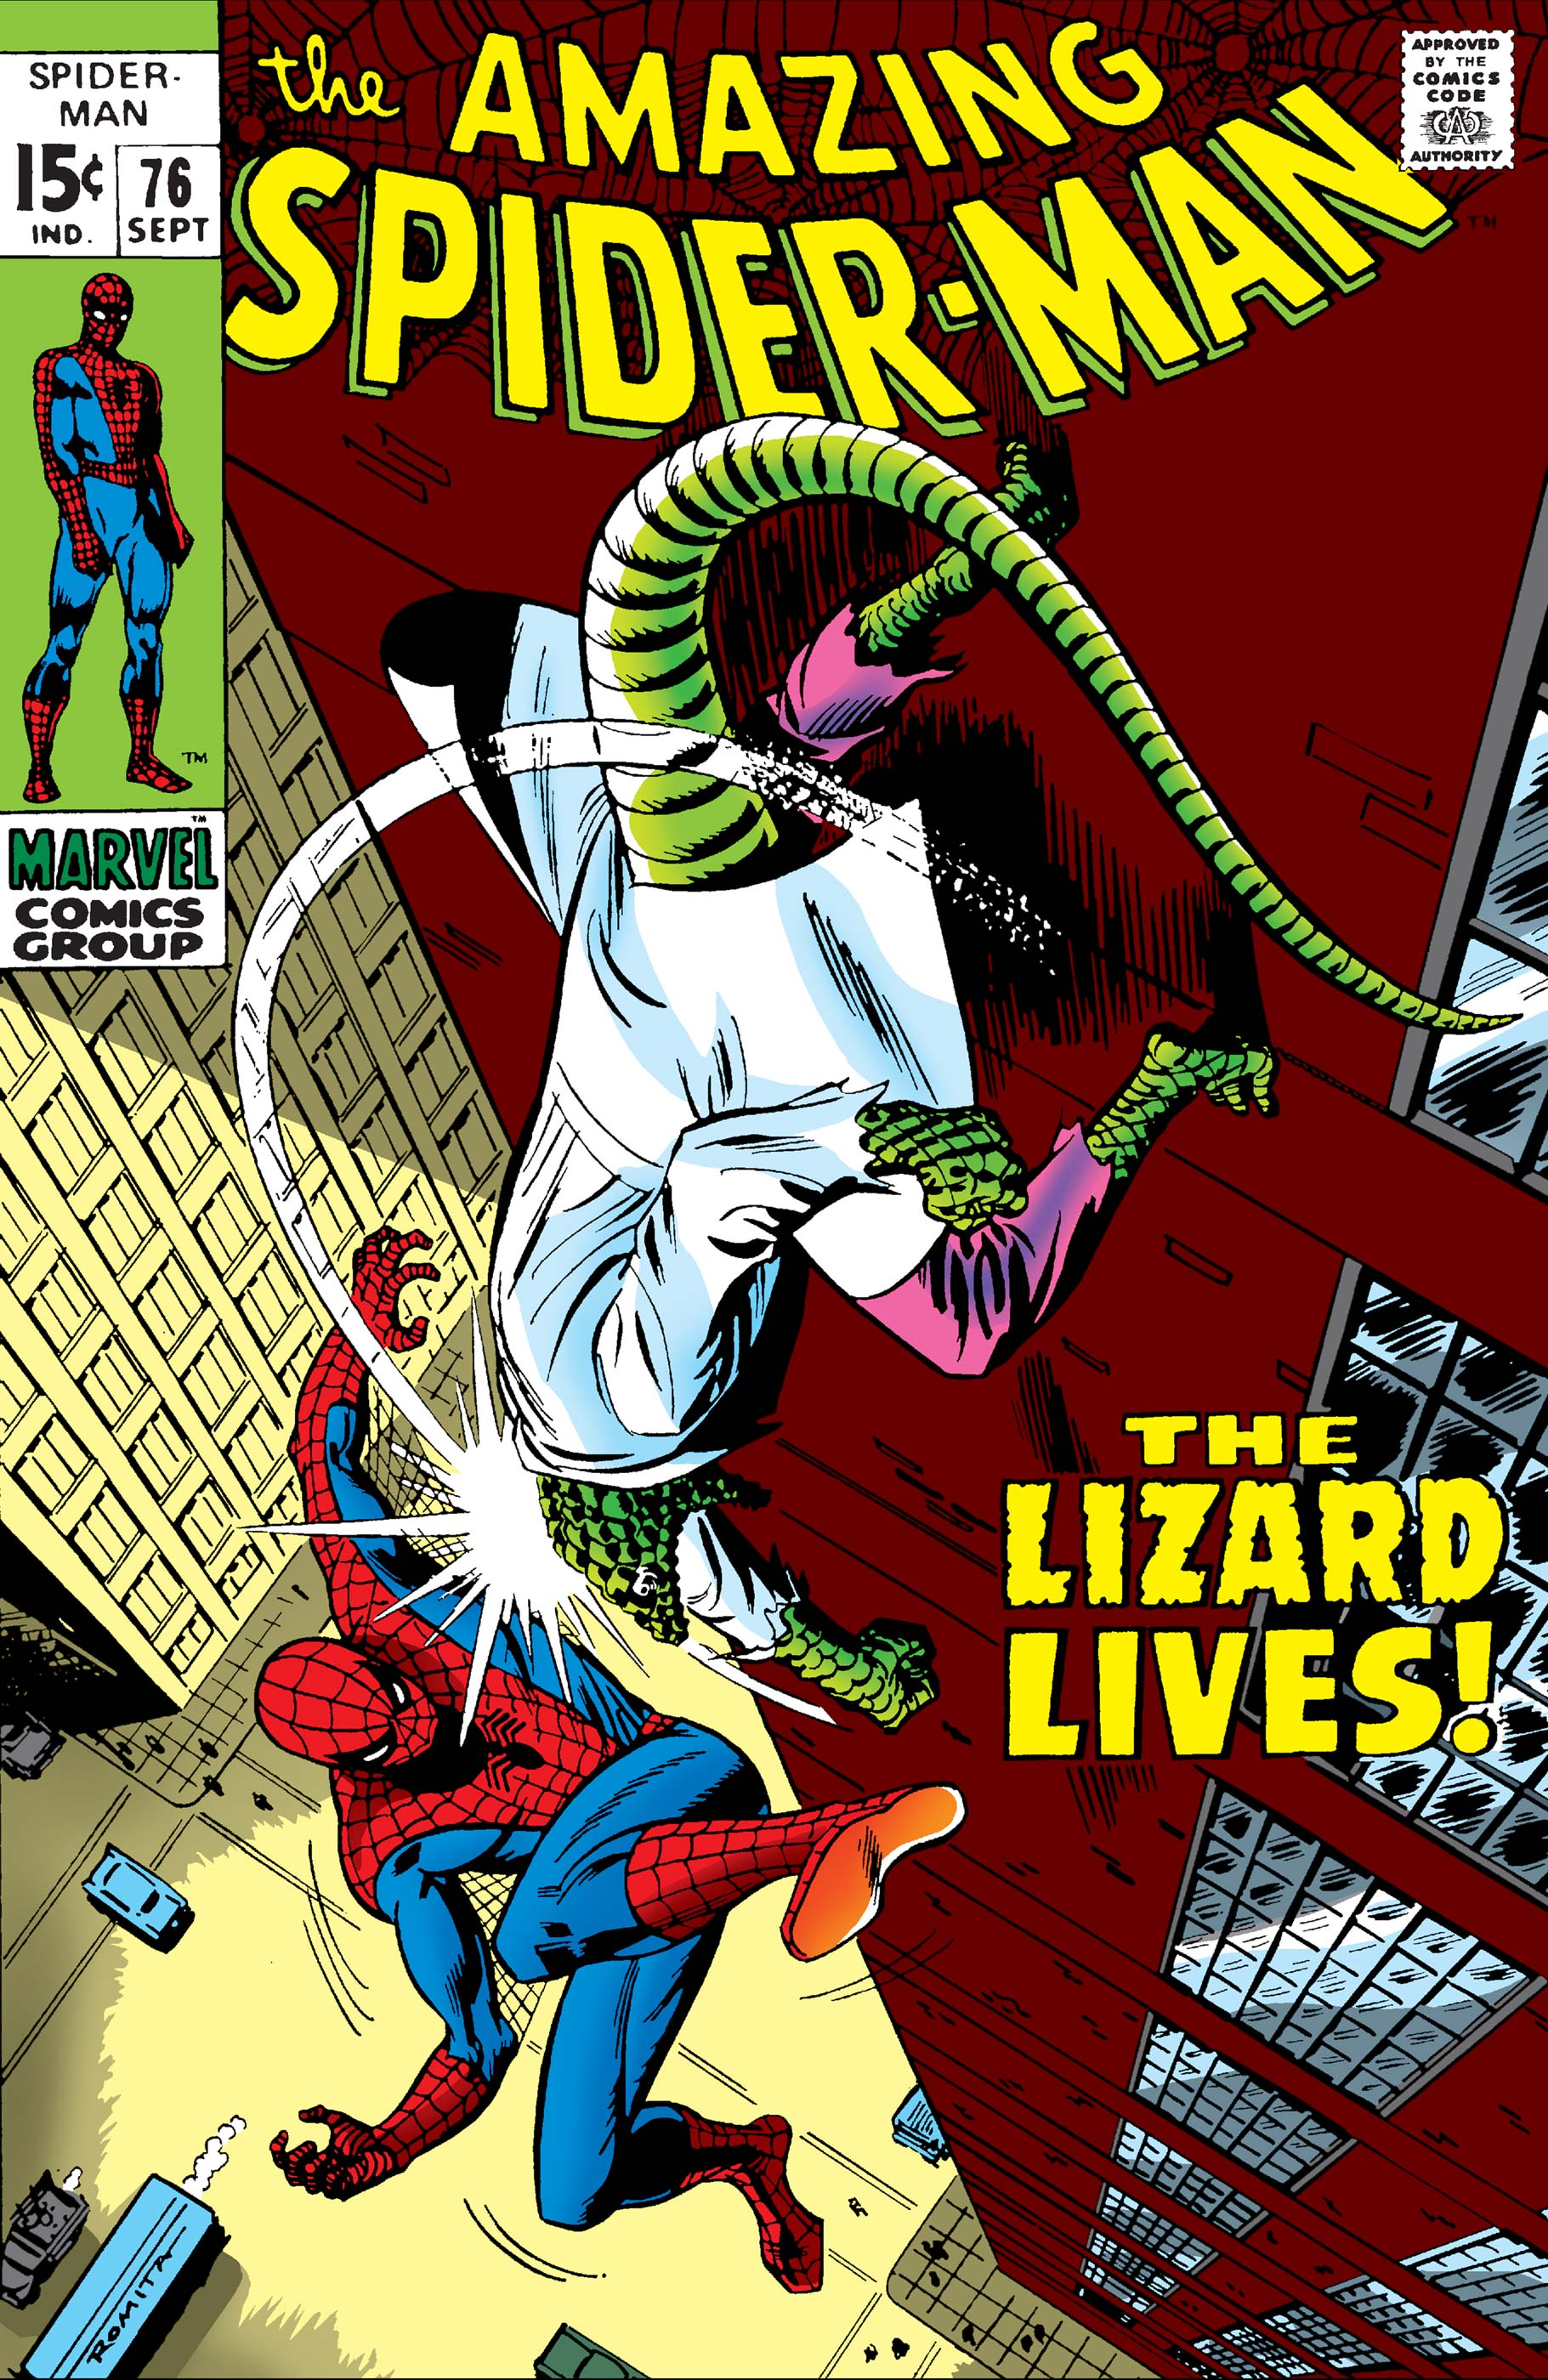 The Amazing Spider-Man (1963) #76